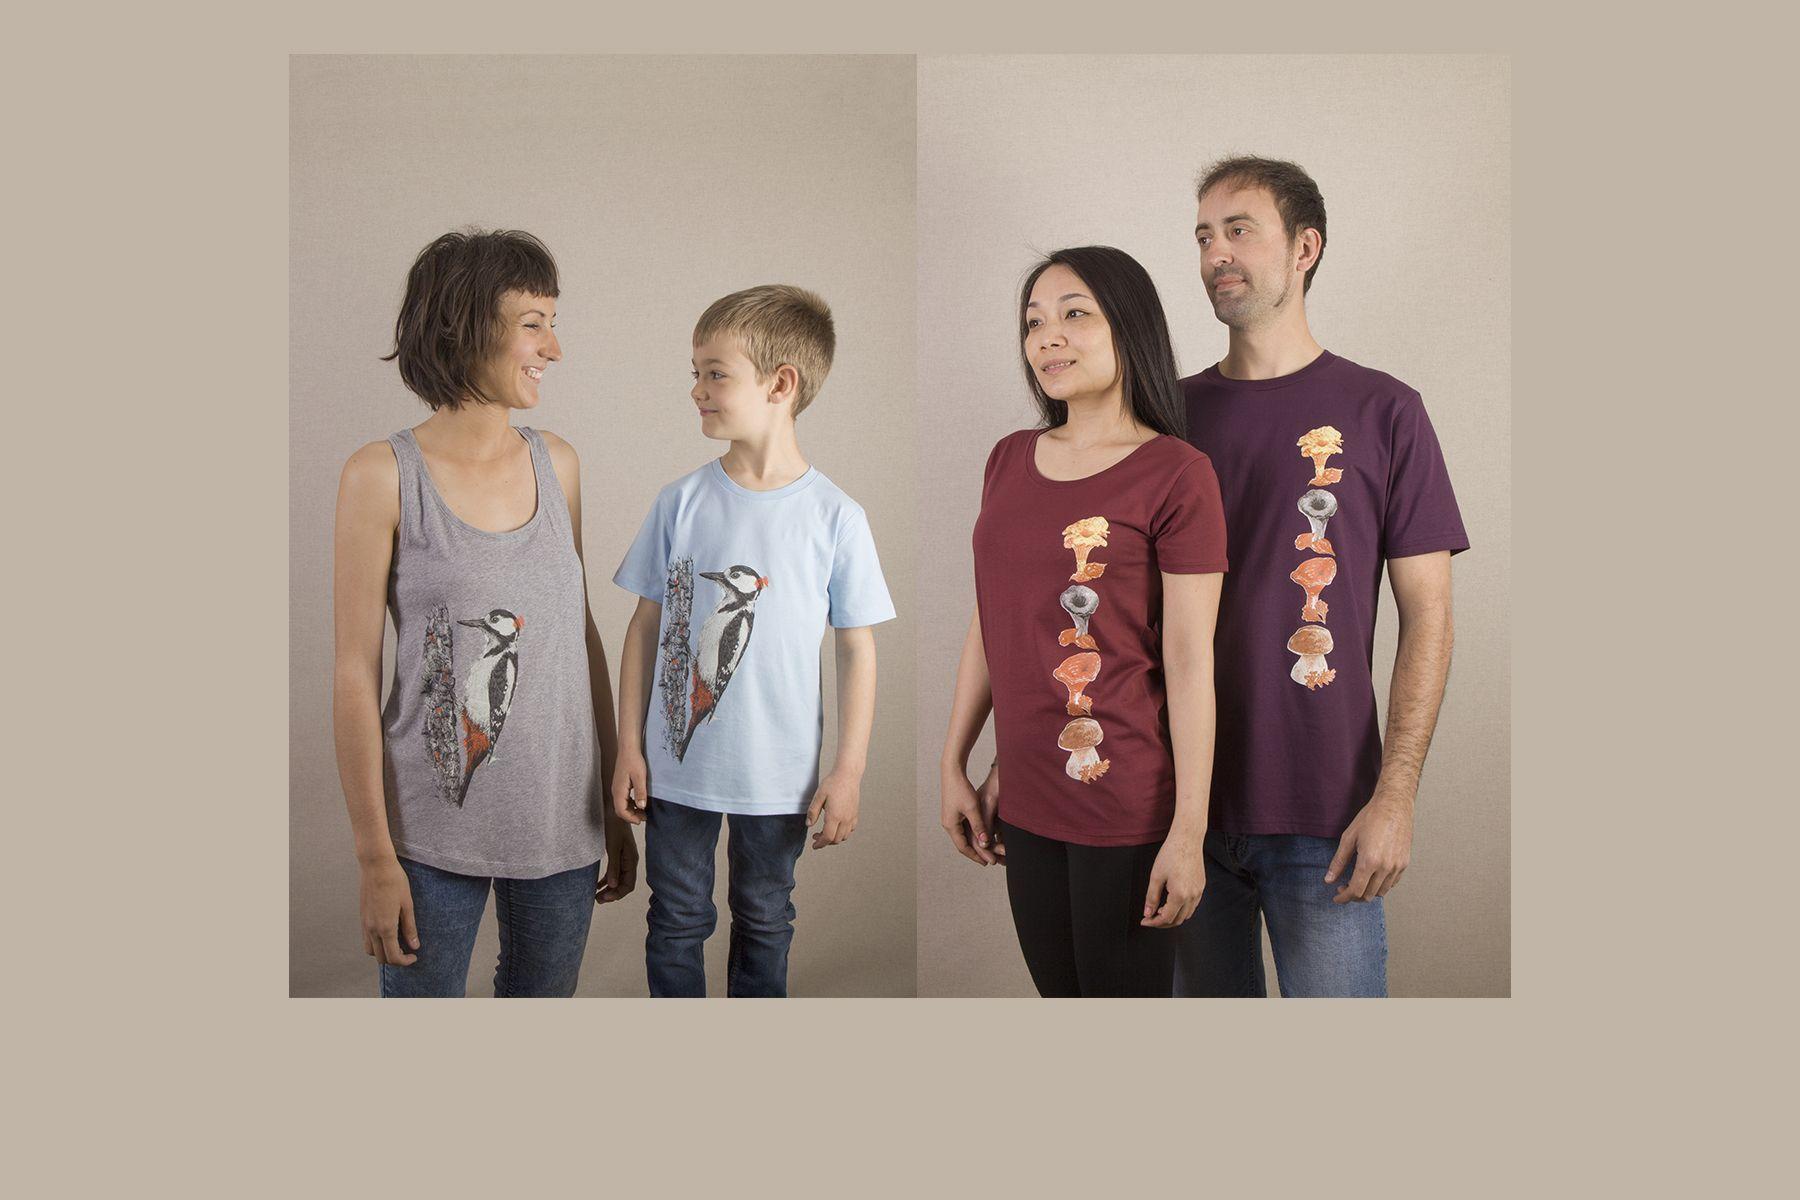 sirem wild-camiseta ecologica-picapinos-setas